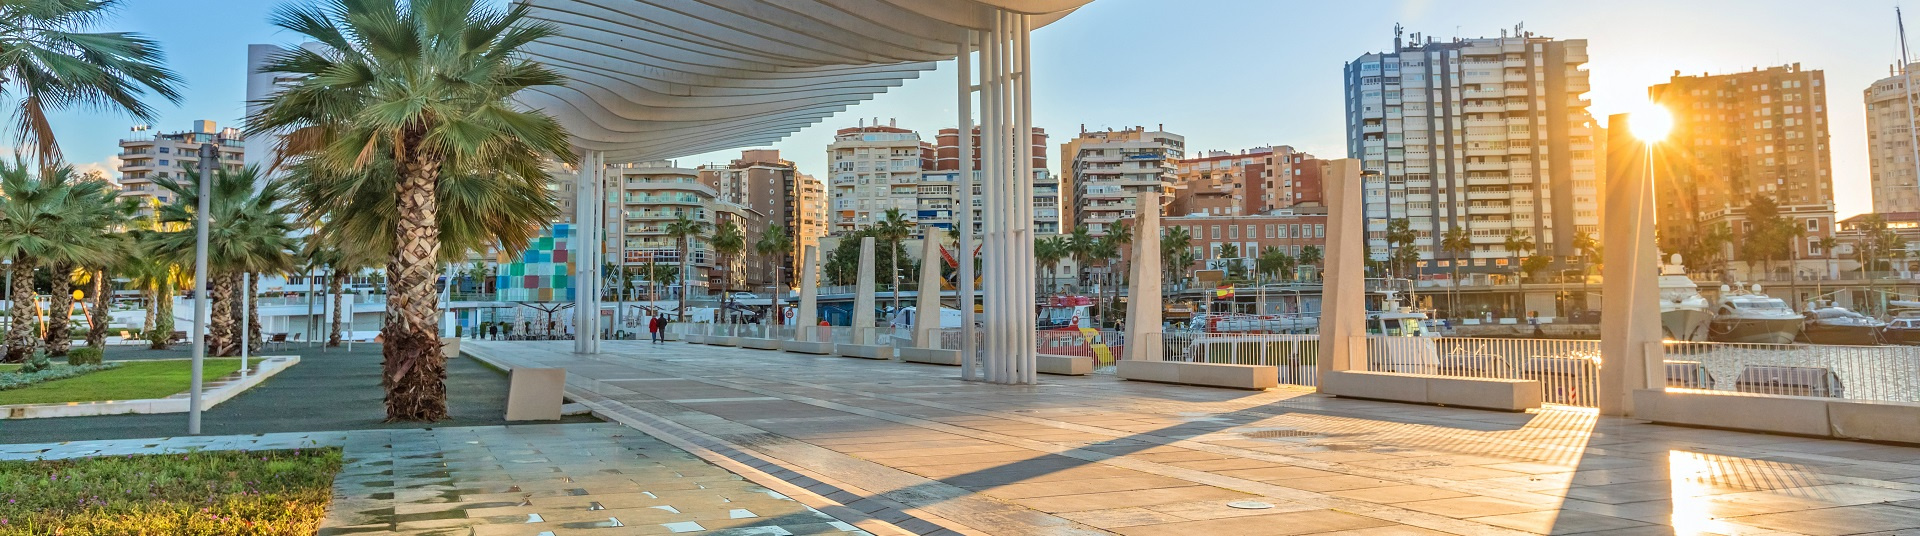 Week-end pas cher Malaga